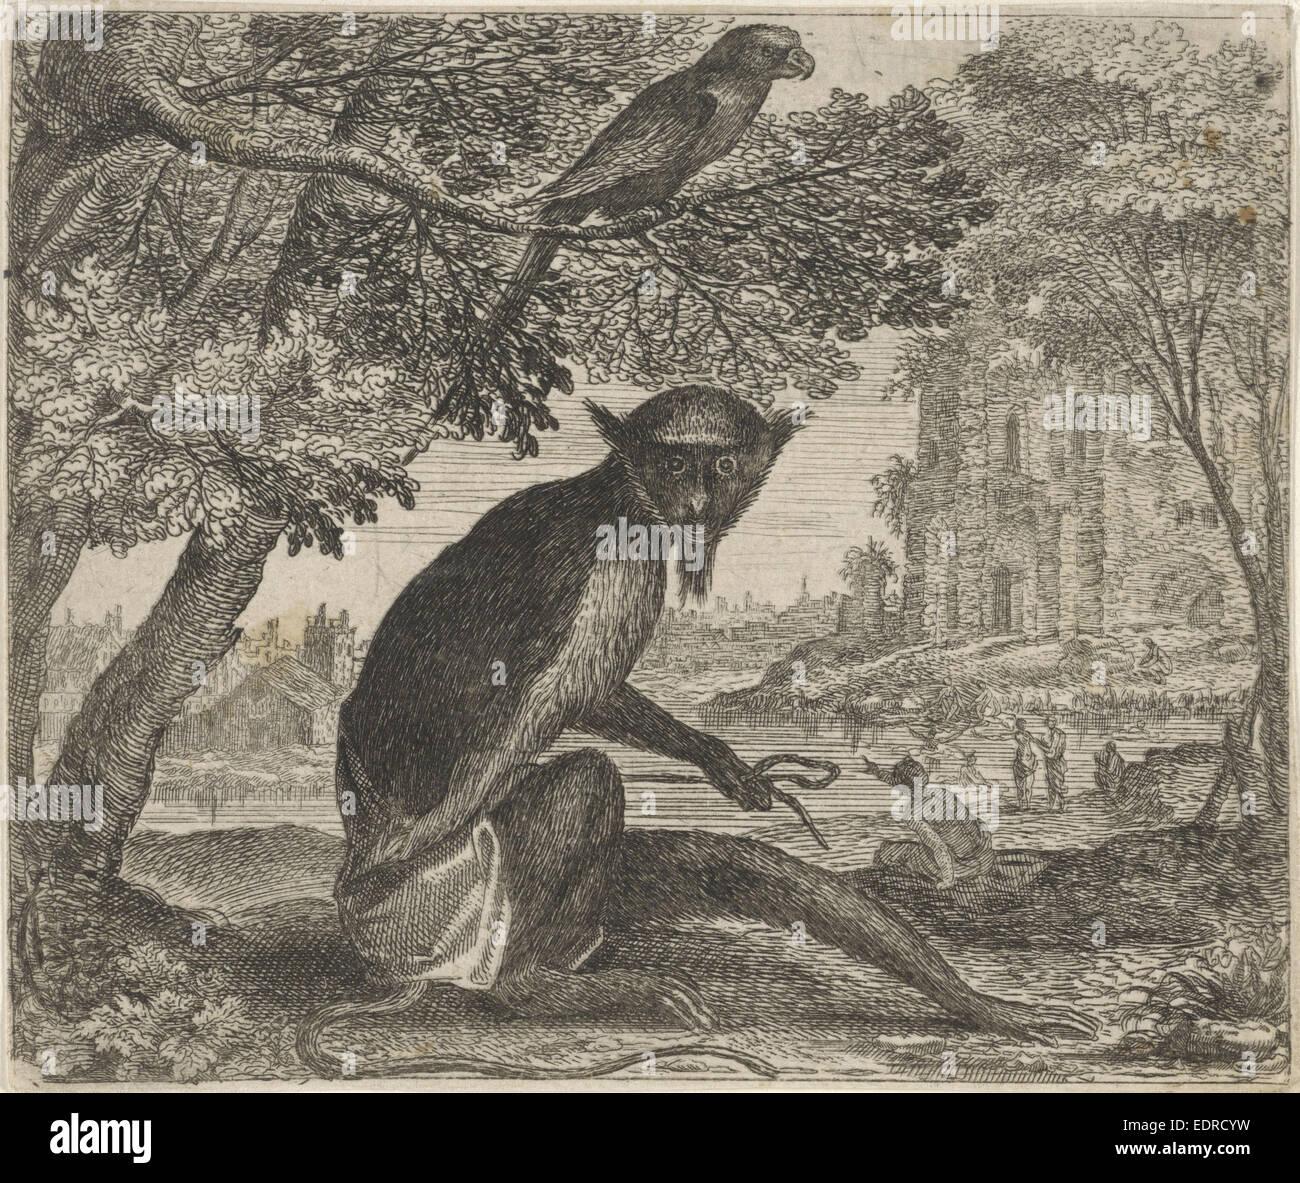 Fable of the parrot and monkey, Aegidius Sadeler, 1608 - Stock Image